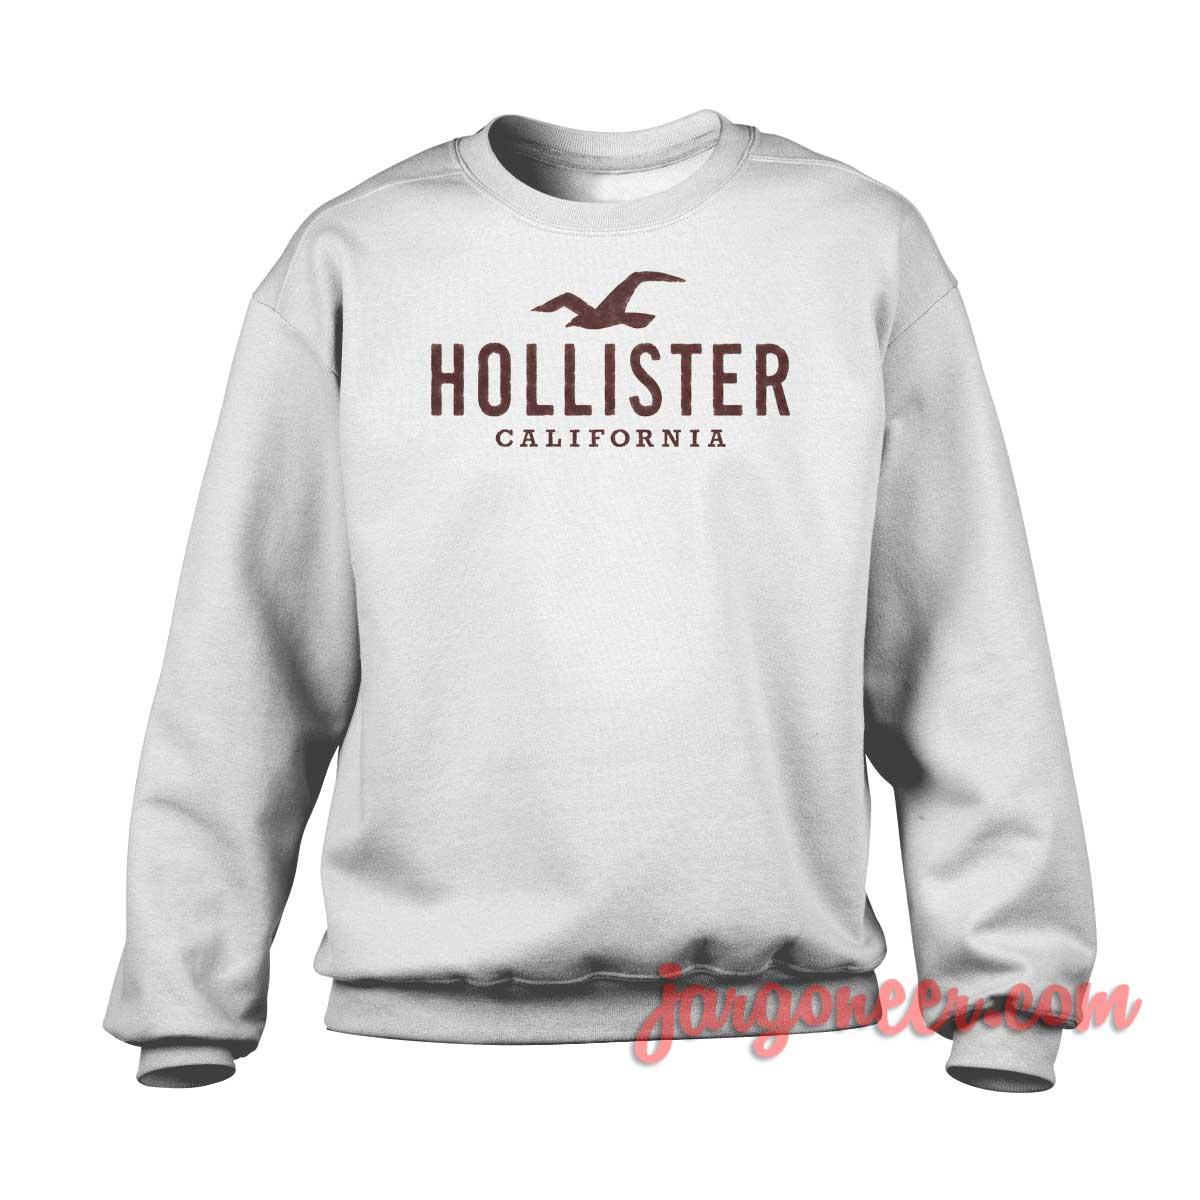 Hollister Womens Pants Size Chart   RLDM